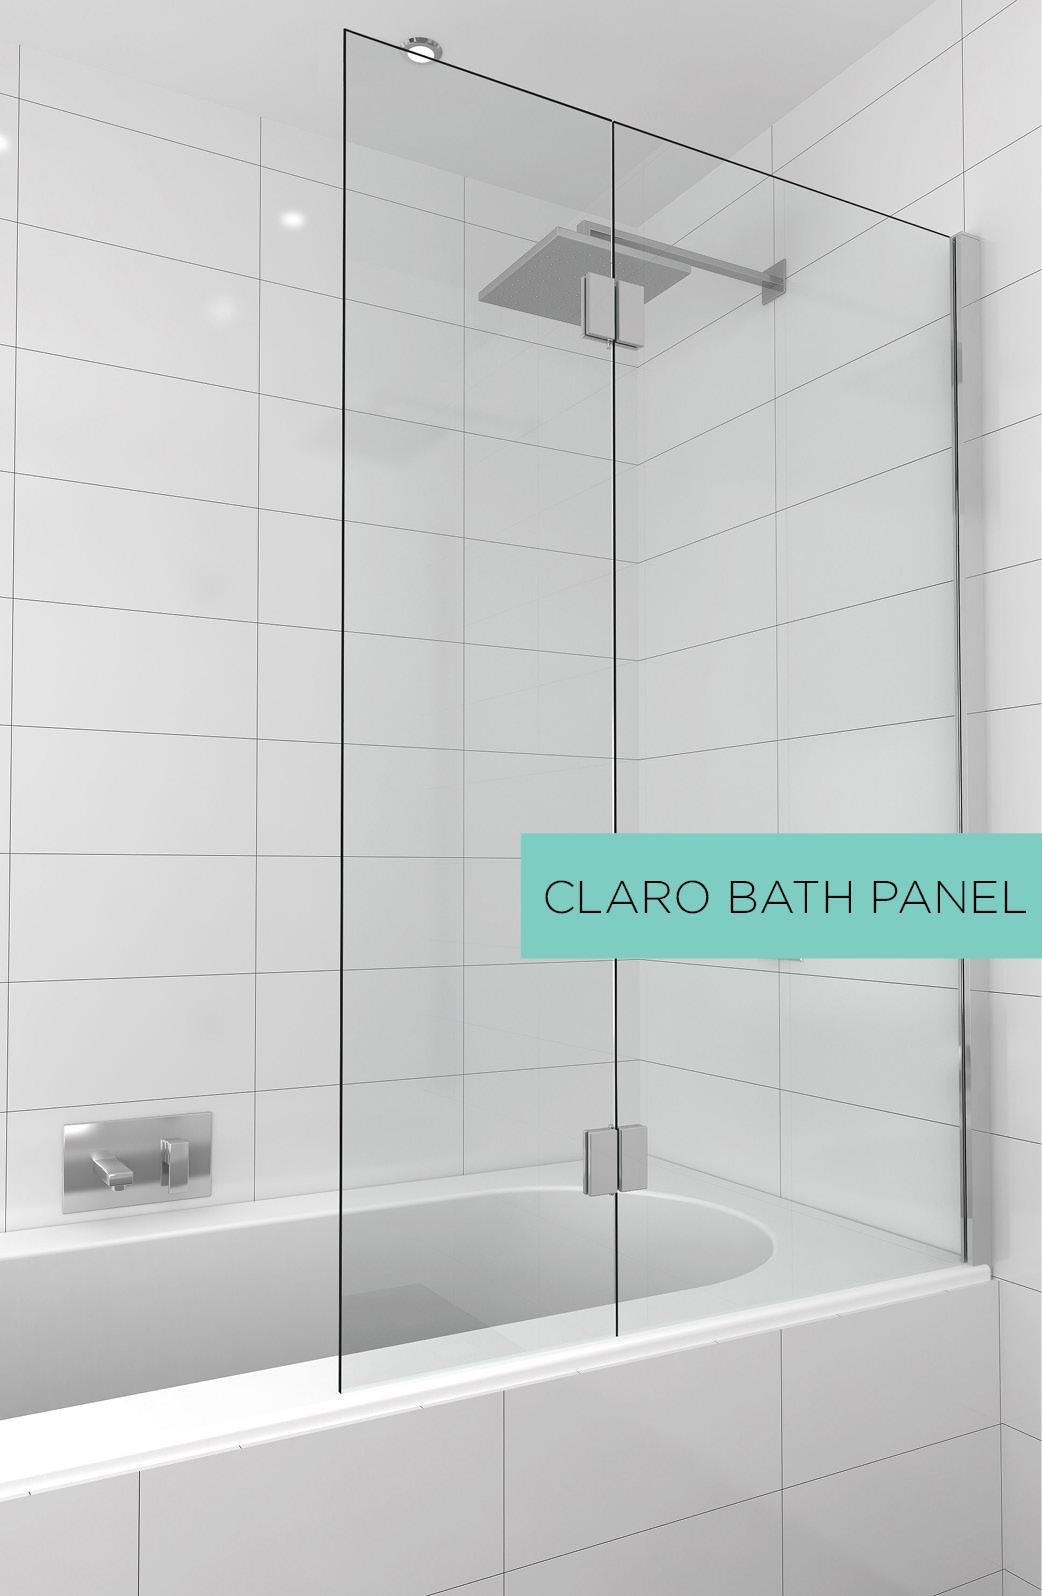 Bath panel render